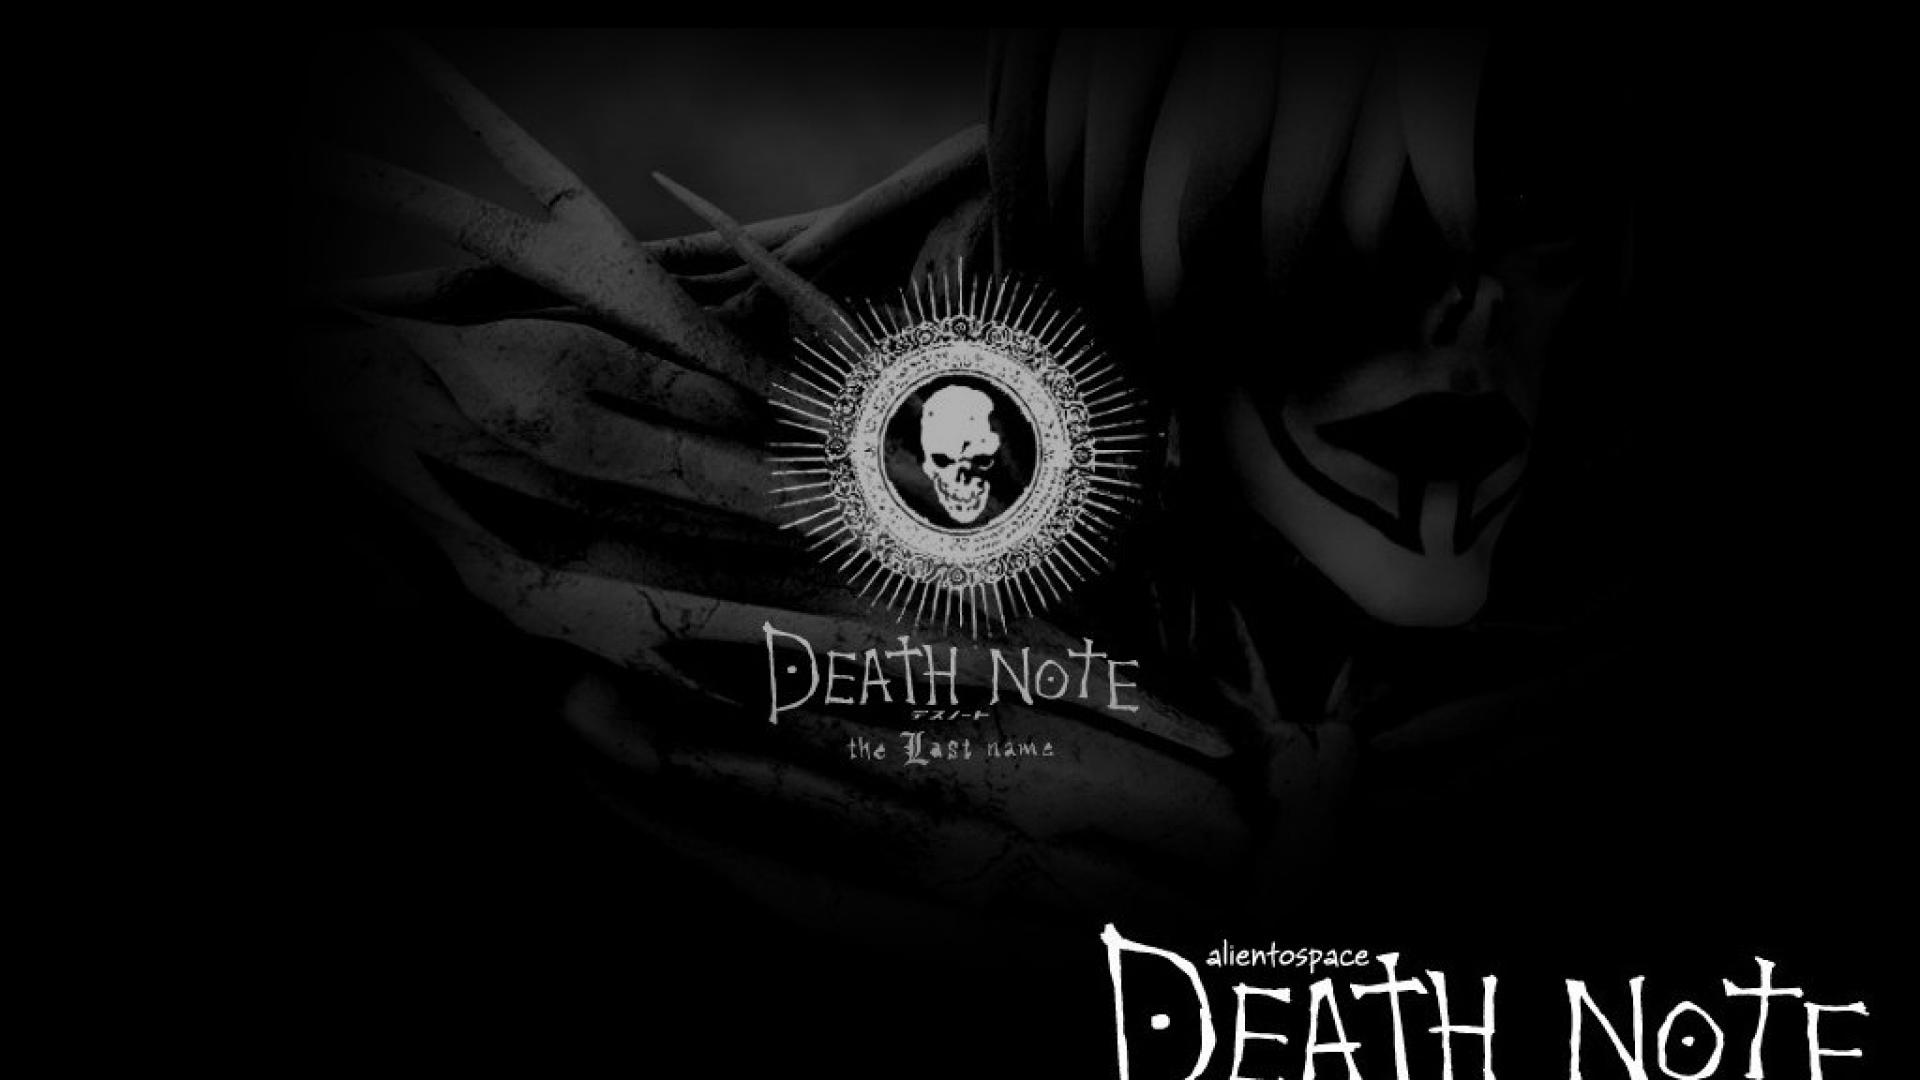 death note skull logo - photo #3